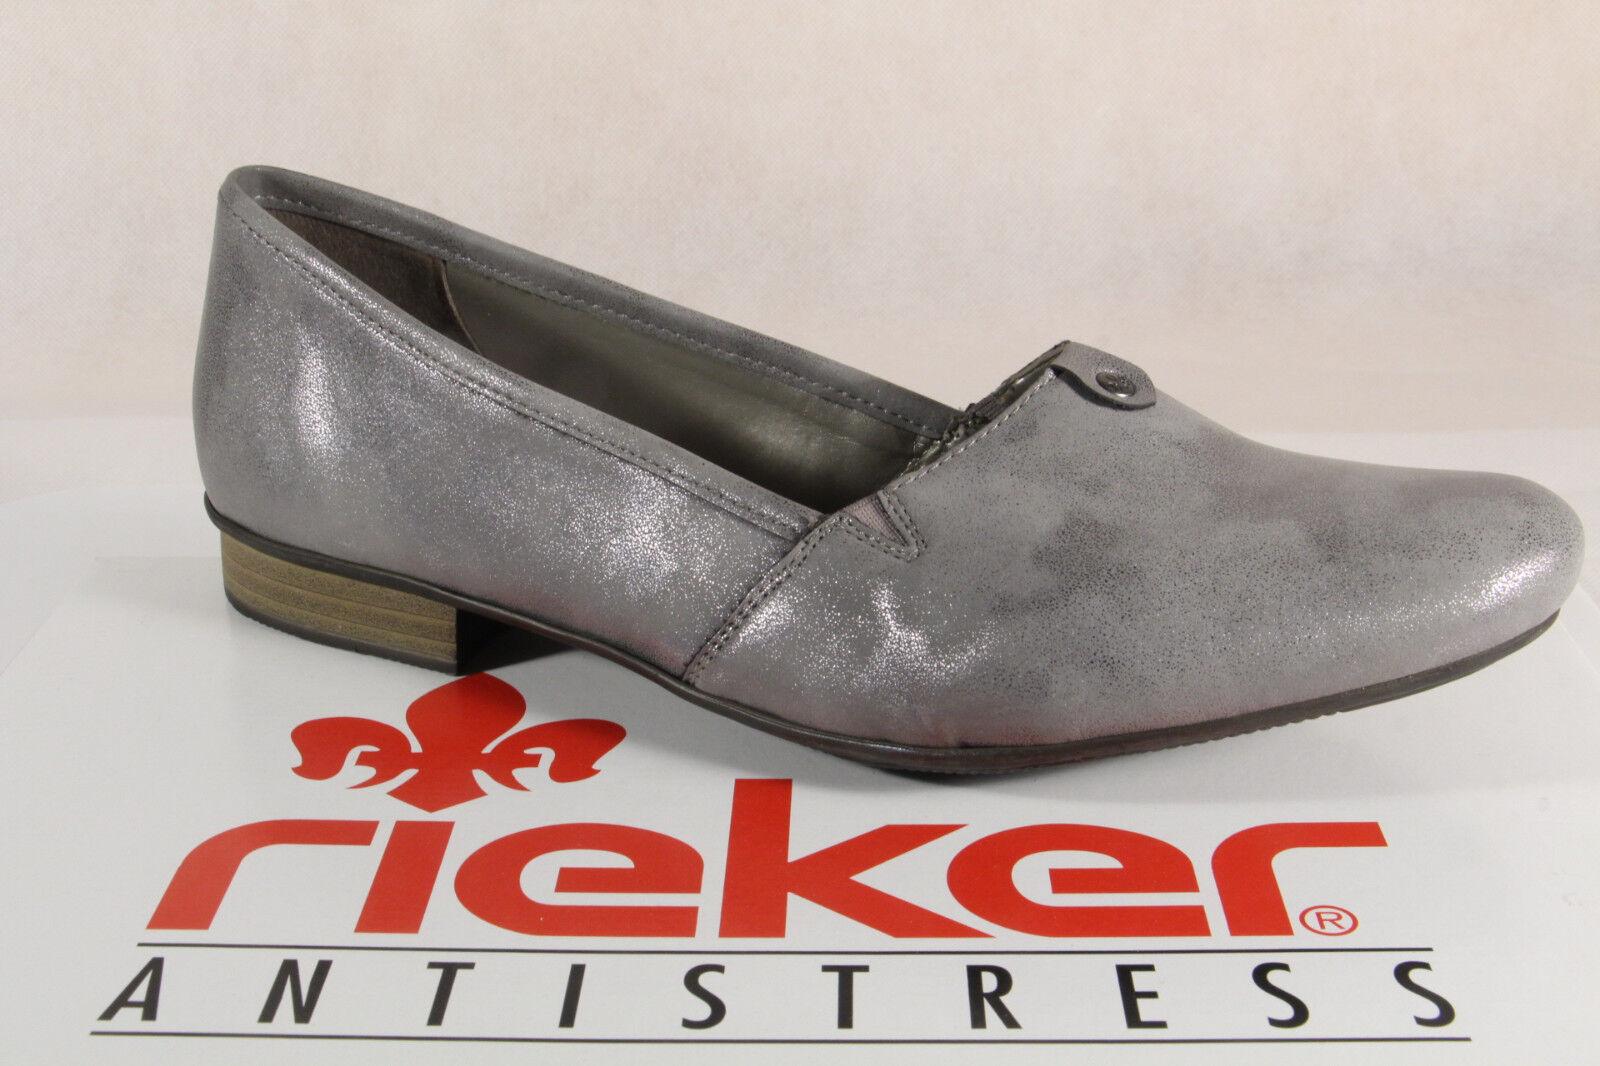 Rieker Damen Slipper Pumps Halbschuhe Ballerina grau, 51961 Neu